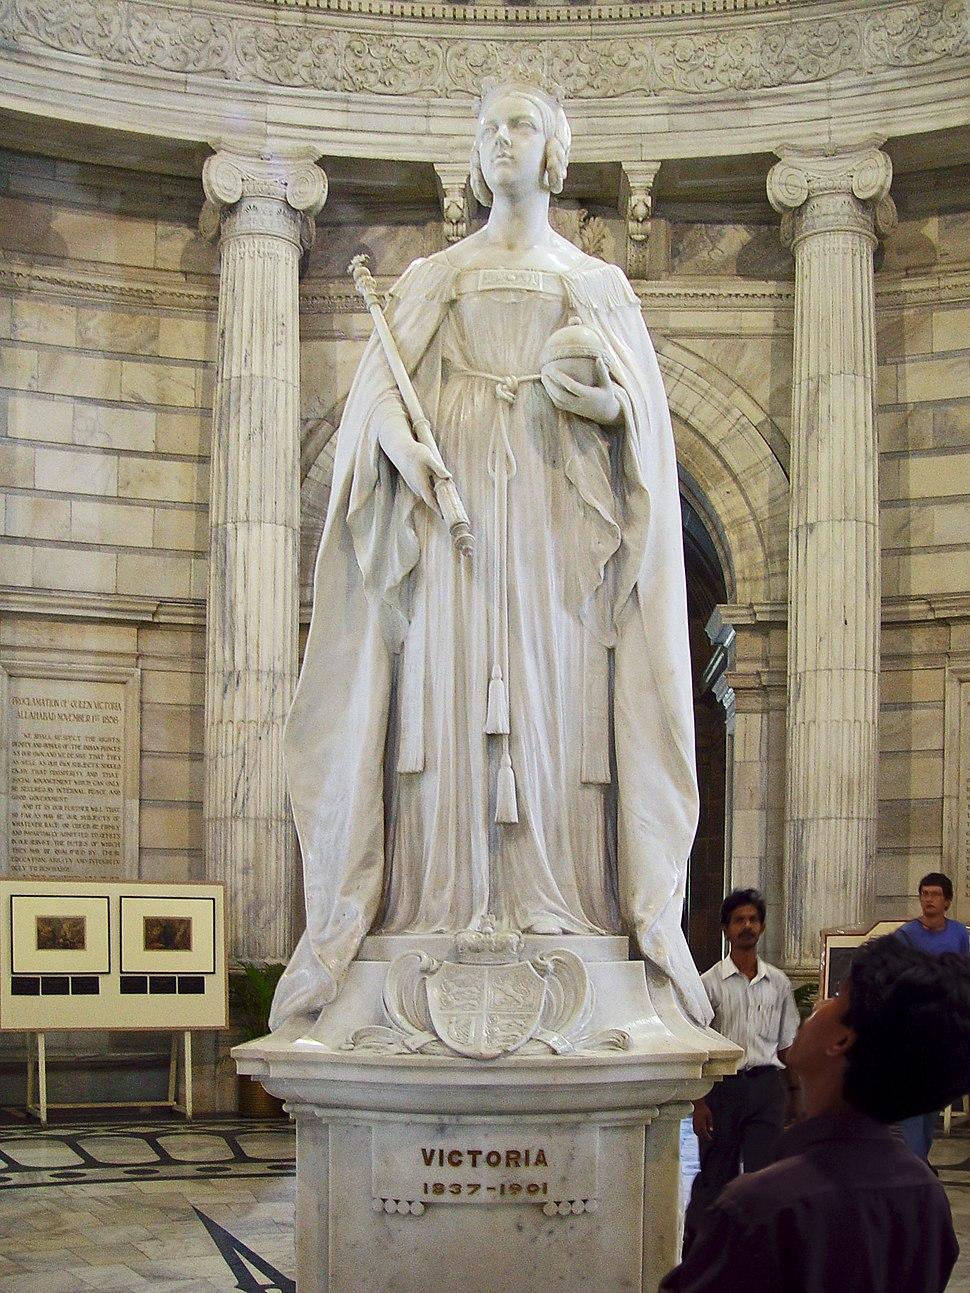 Queen Victoria's statue inside the memorial in Kolkata